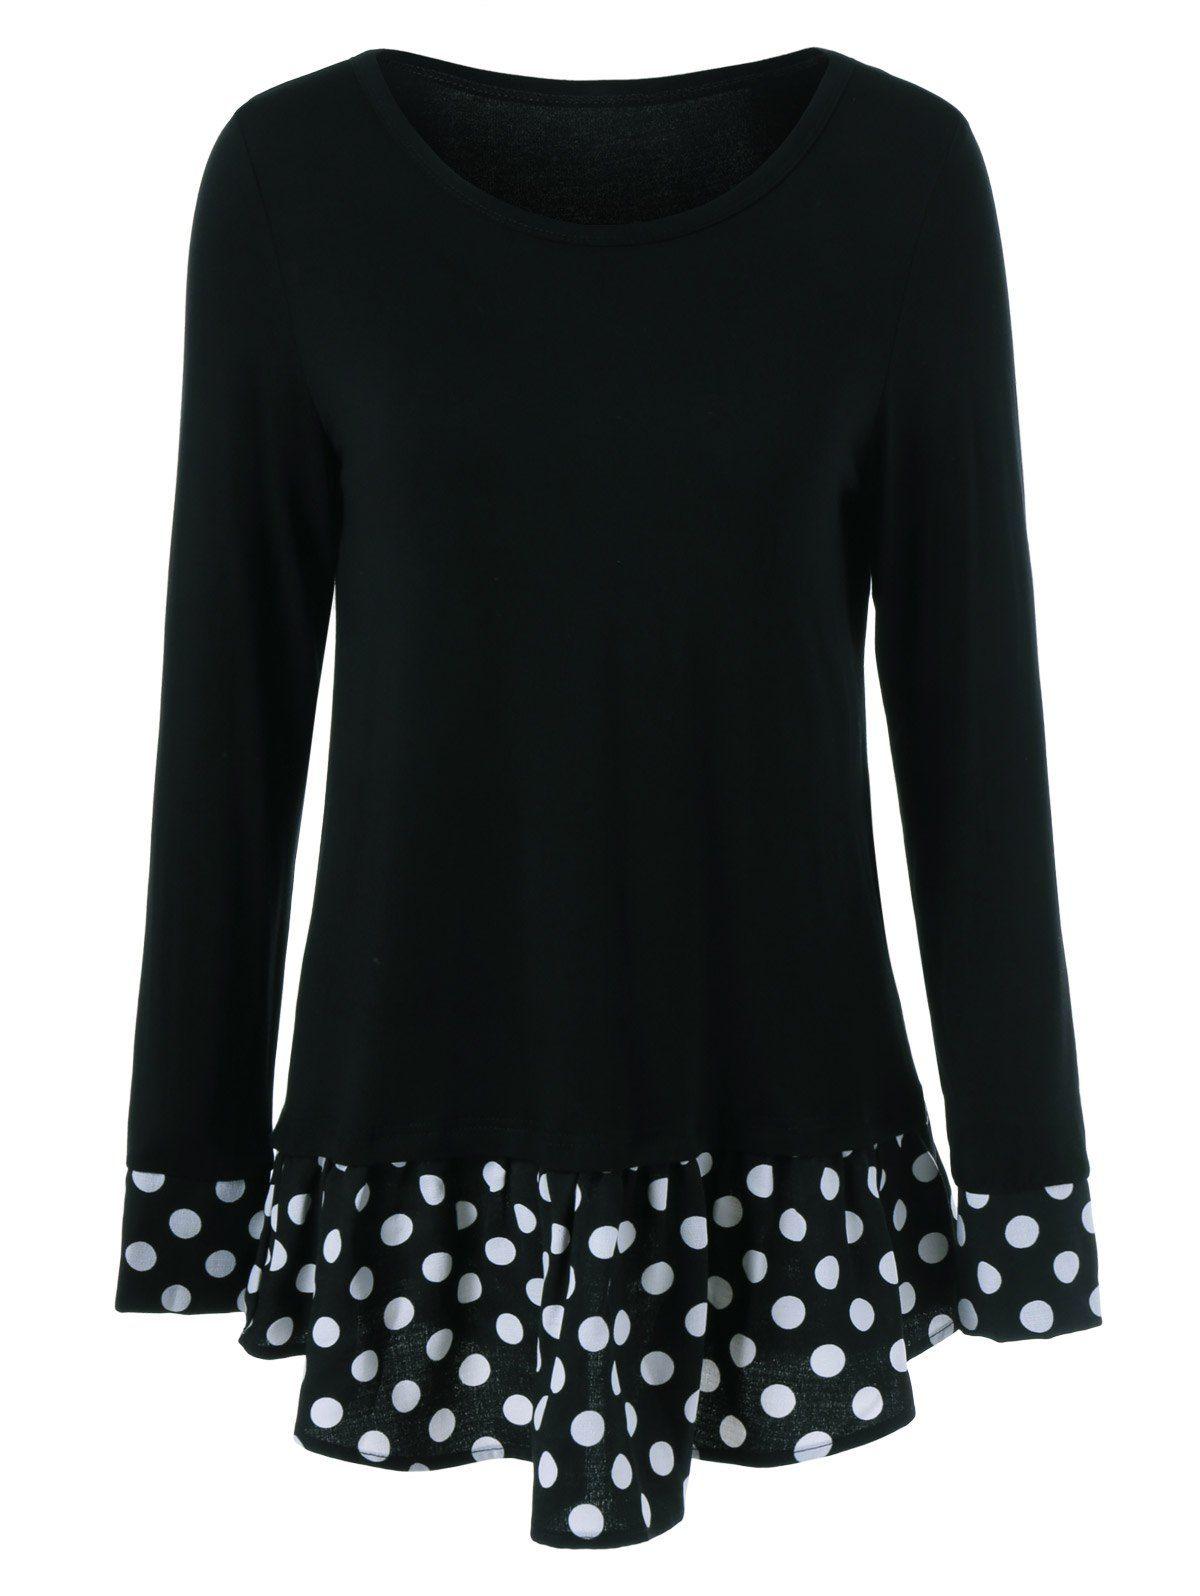 $9.47 for Flounced Polka Dot Patchwork T-Shirt in Black | Sammydress.com